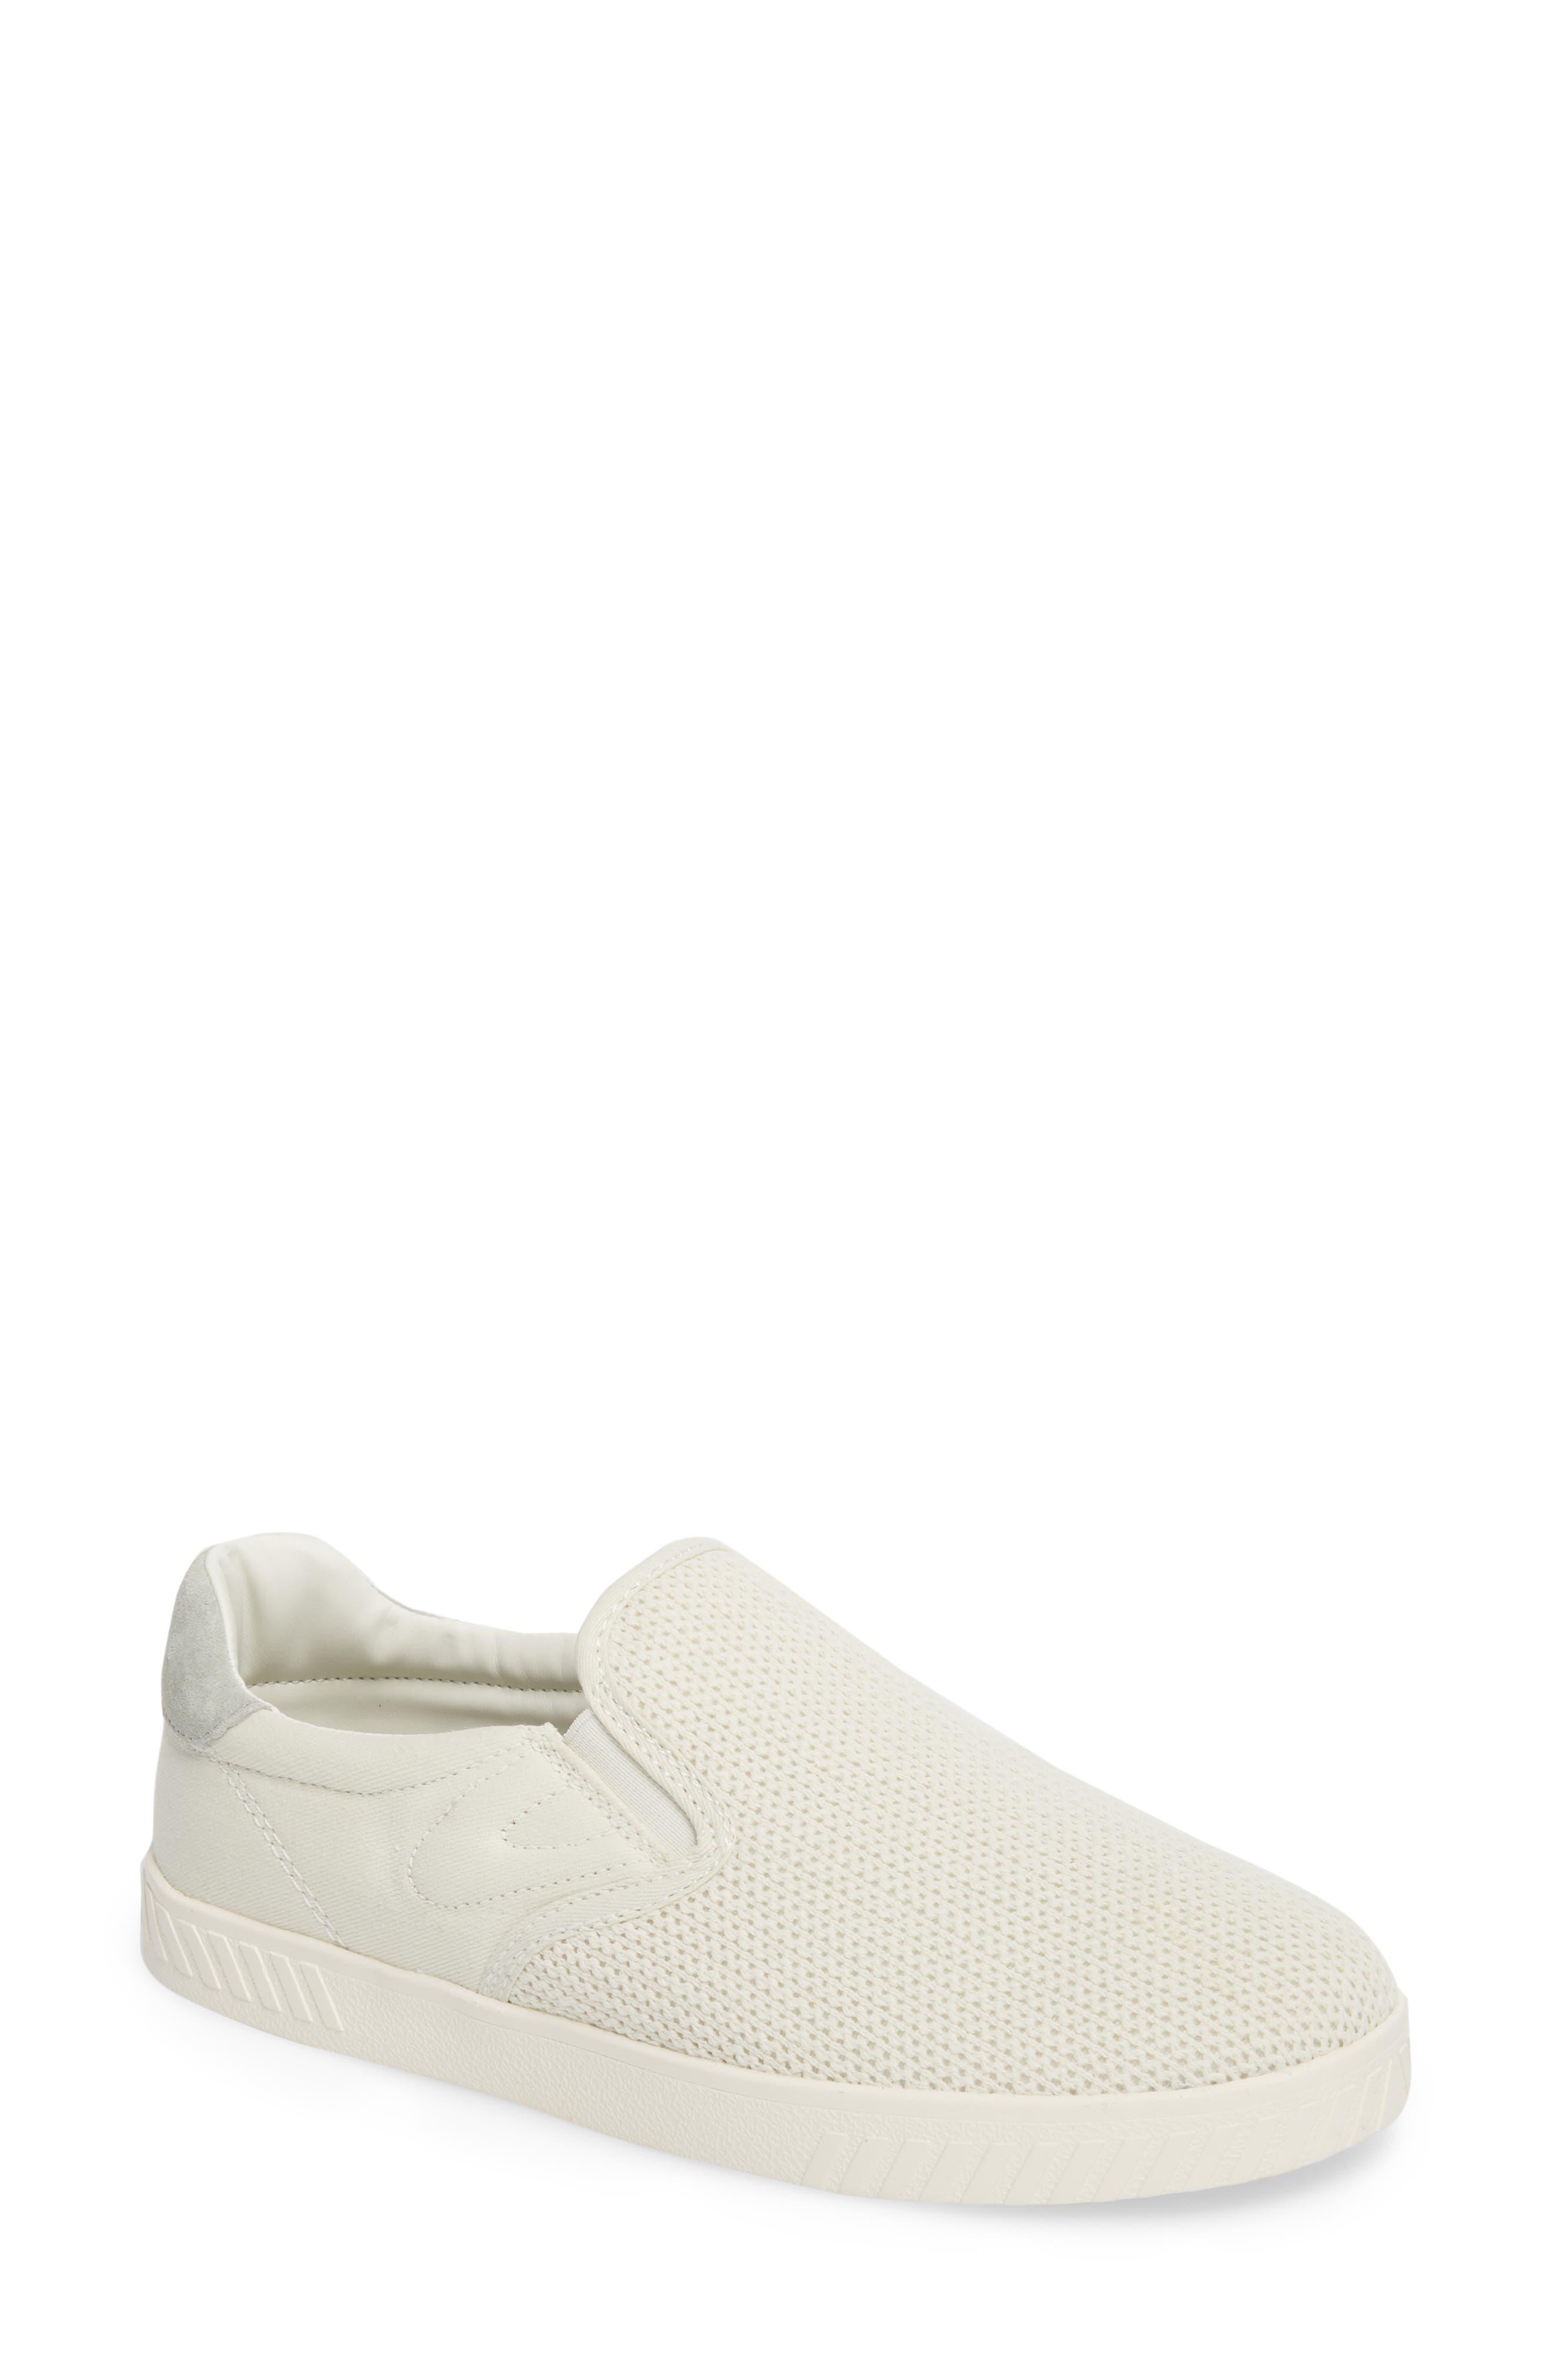 Cruz Mesh Slip-On Sneaker,                             Main thumbnail 1, color,                             Vintage White